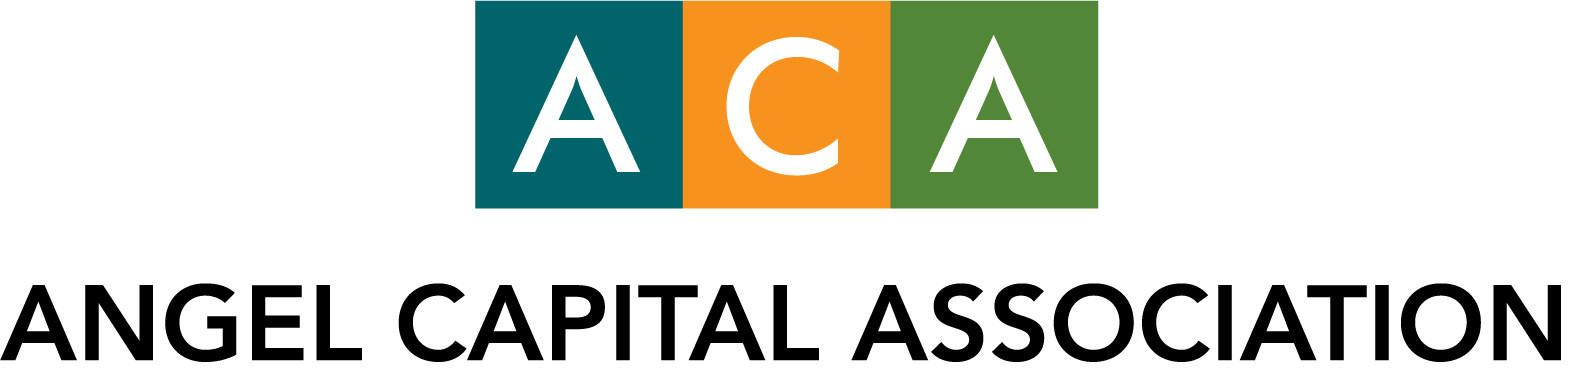 Angel Capital Association Logo